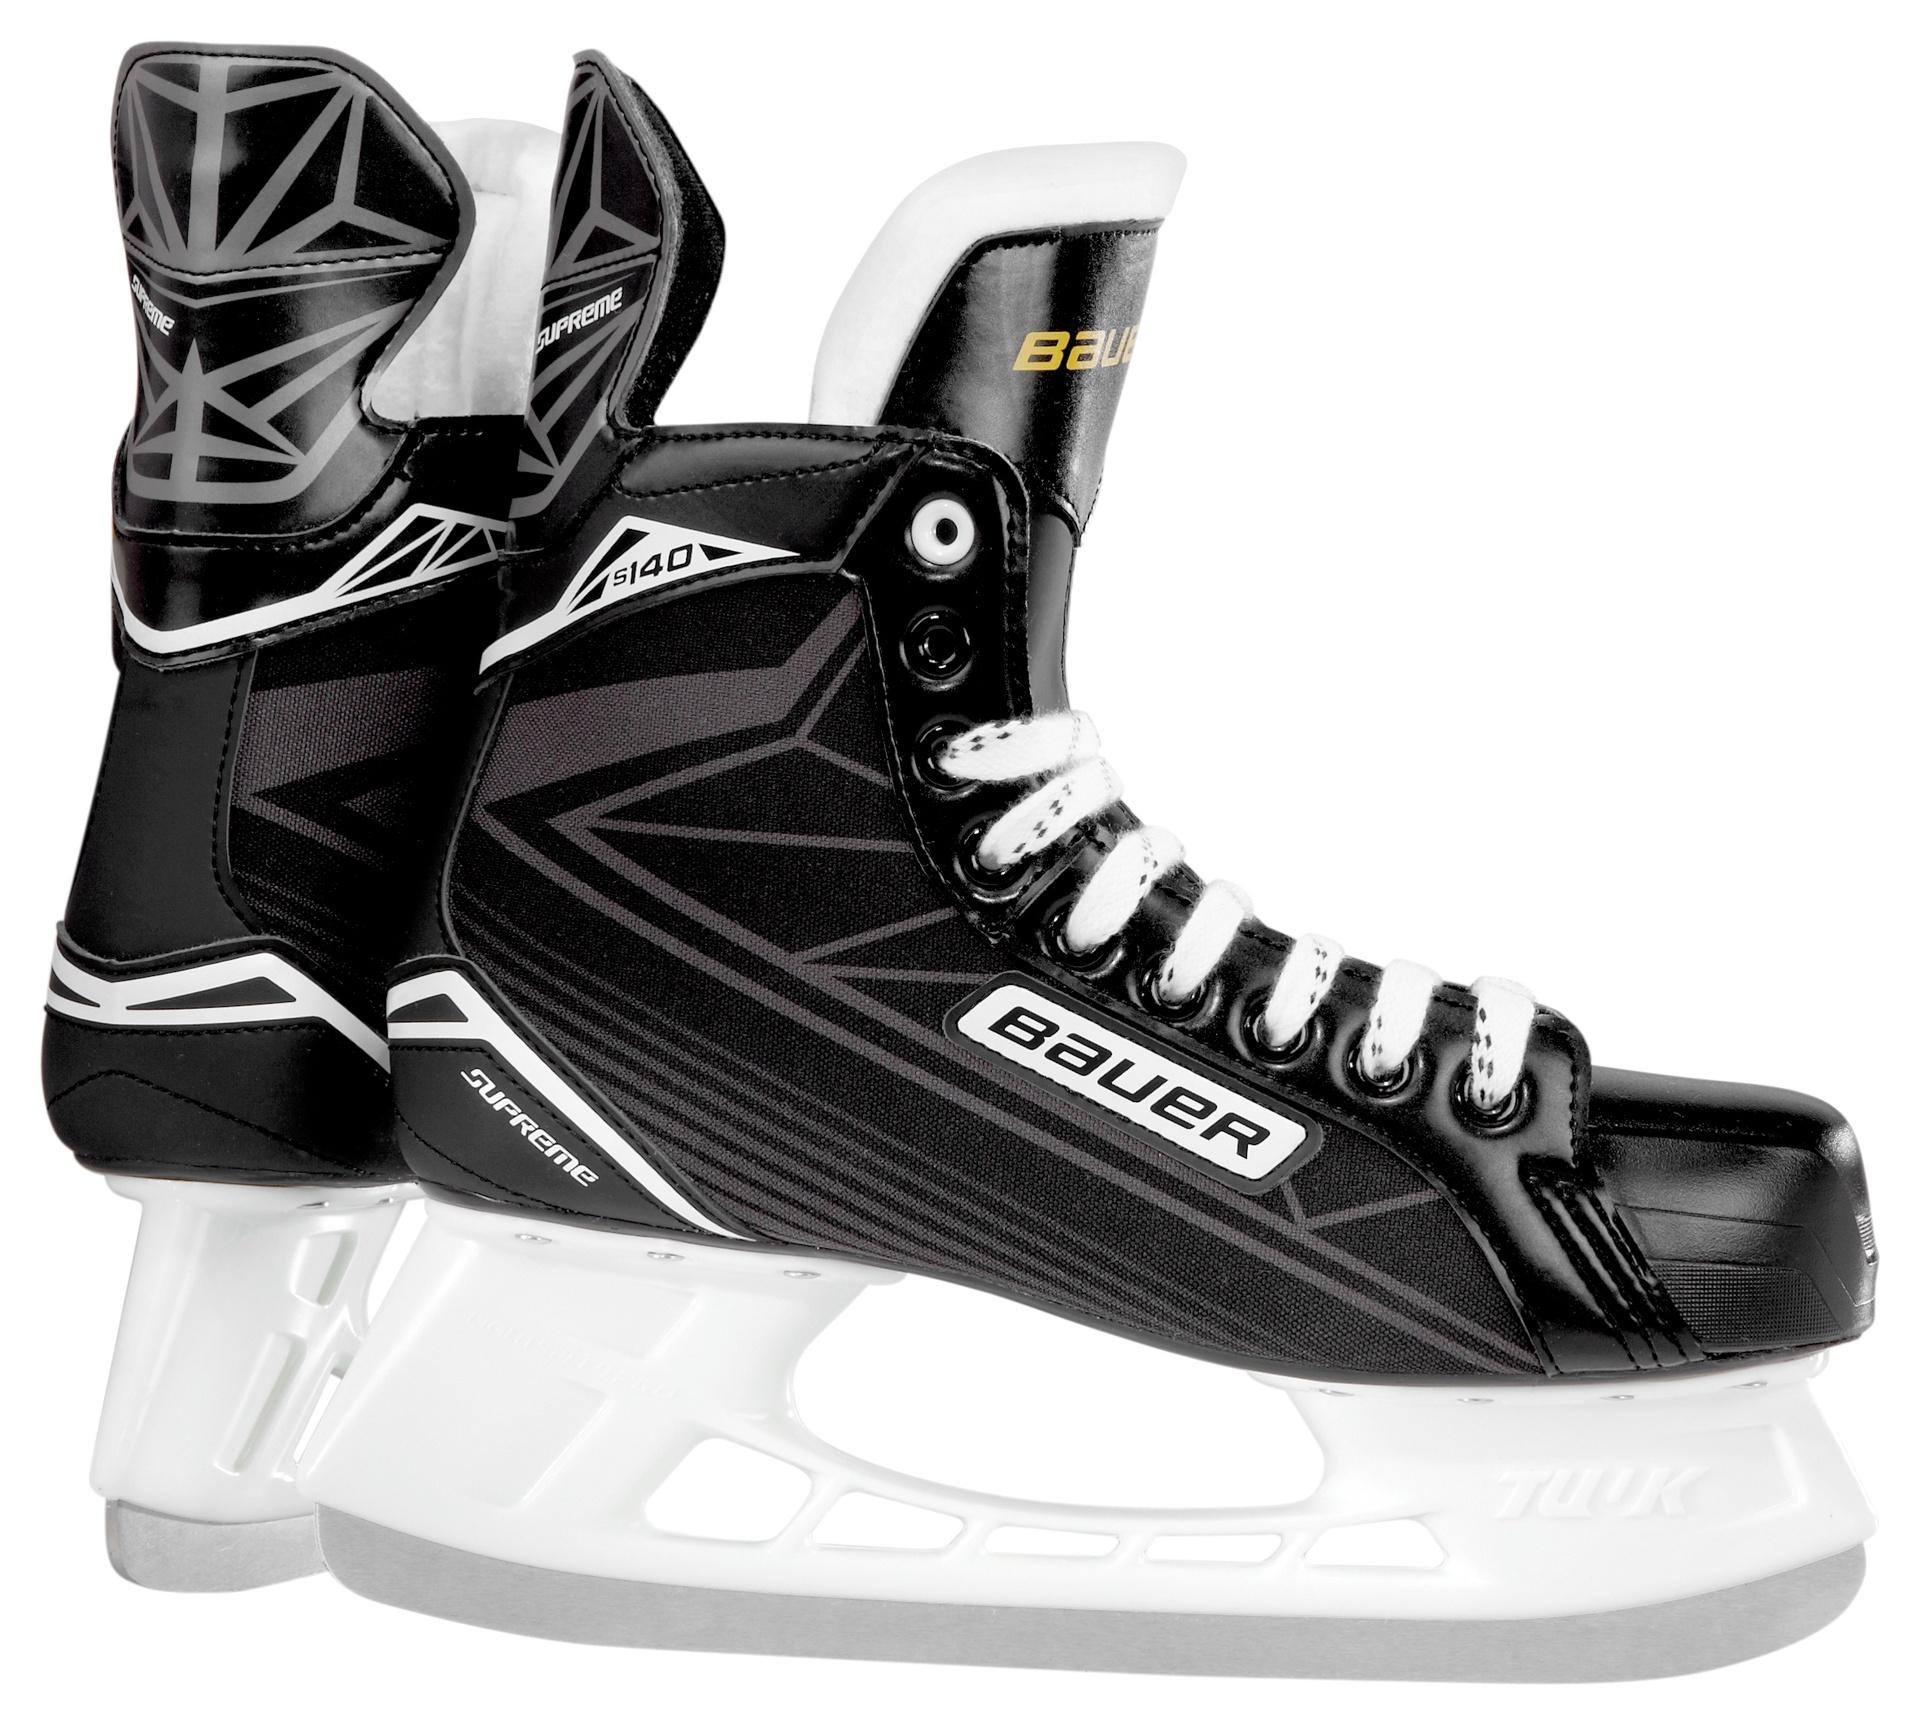 Bauer Supreme S140 Skates-Youth